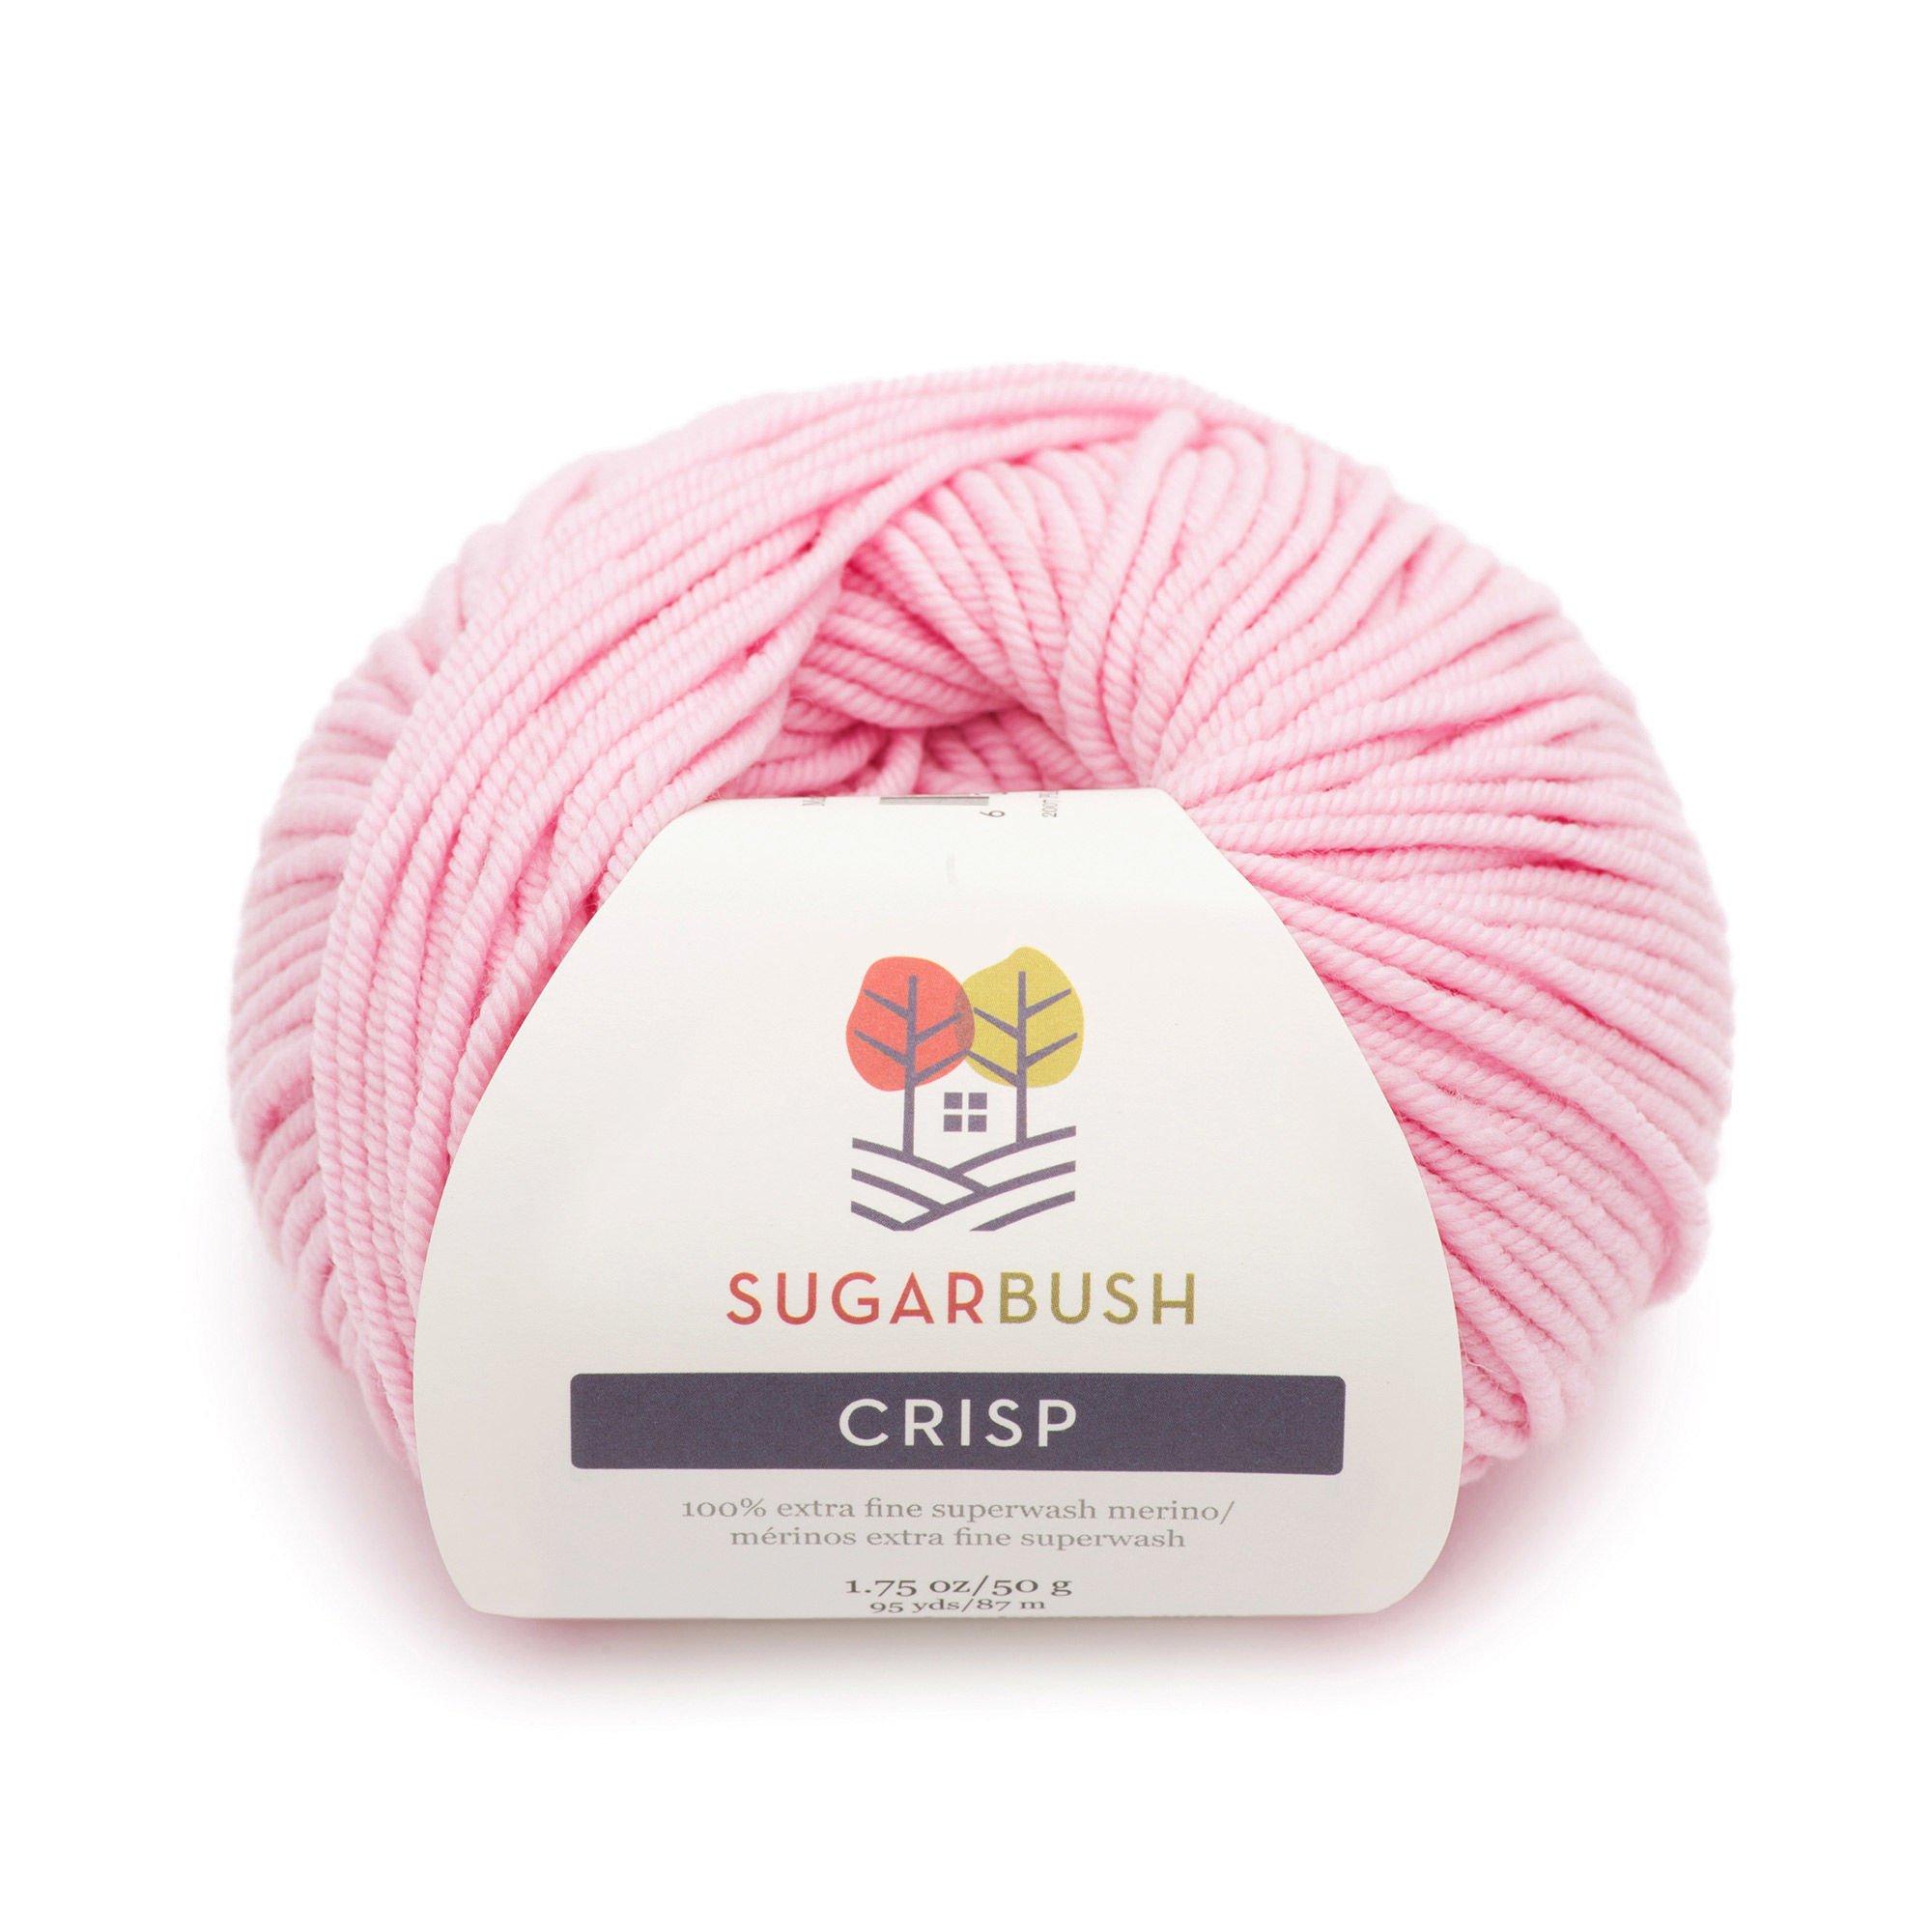 sugar bush crisp